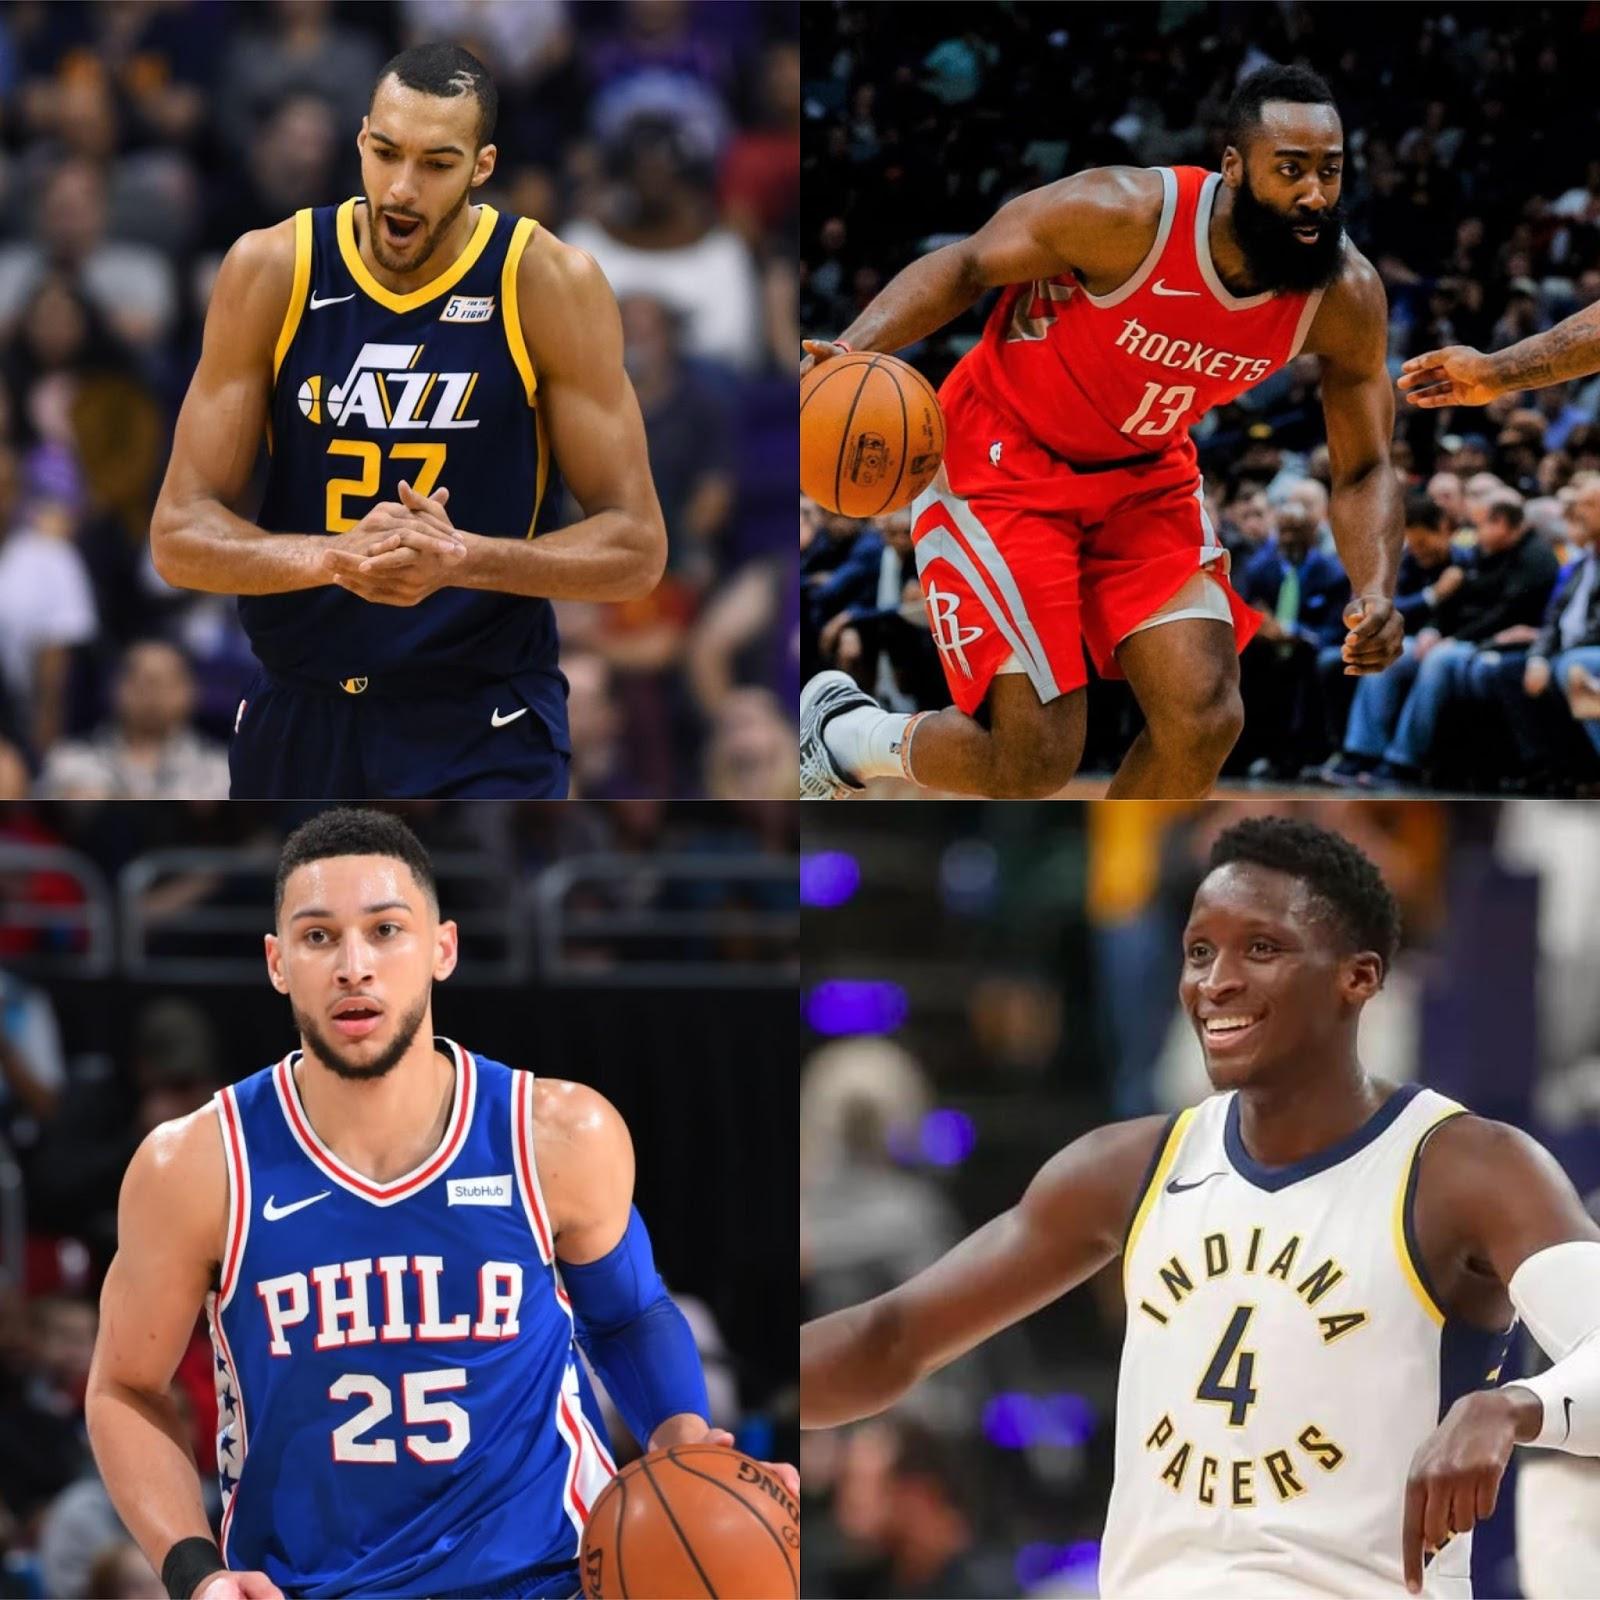 Nba Rookie Award Predictions For 2018 19 Season: DAR Sports: 2017-2018 NBA Season Awards